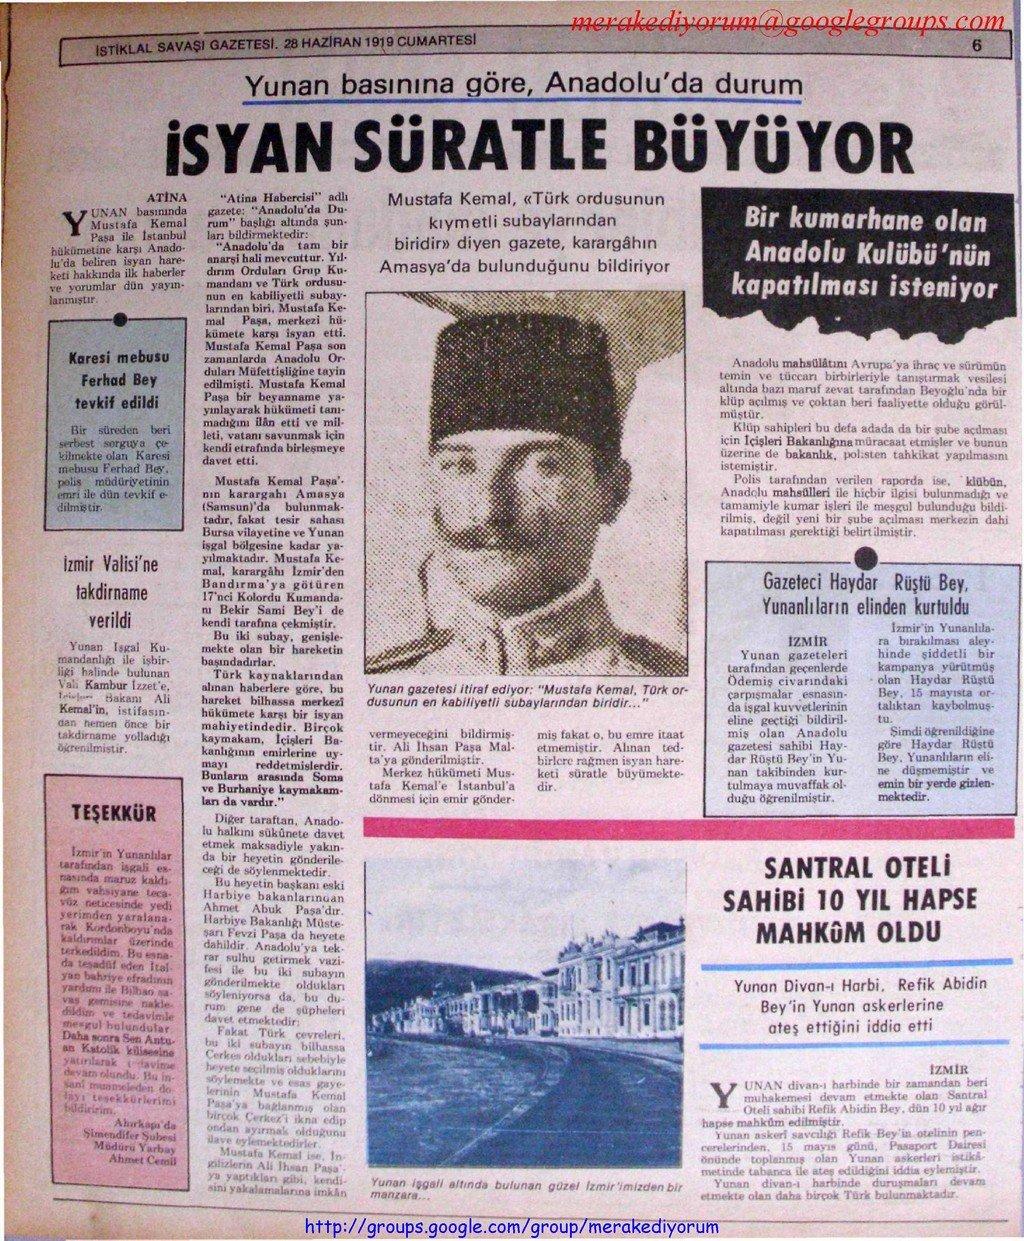 istiklal savaşı gazetesi - 28 haziran 1919